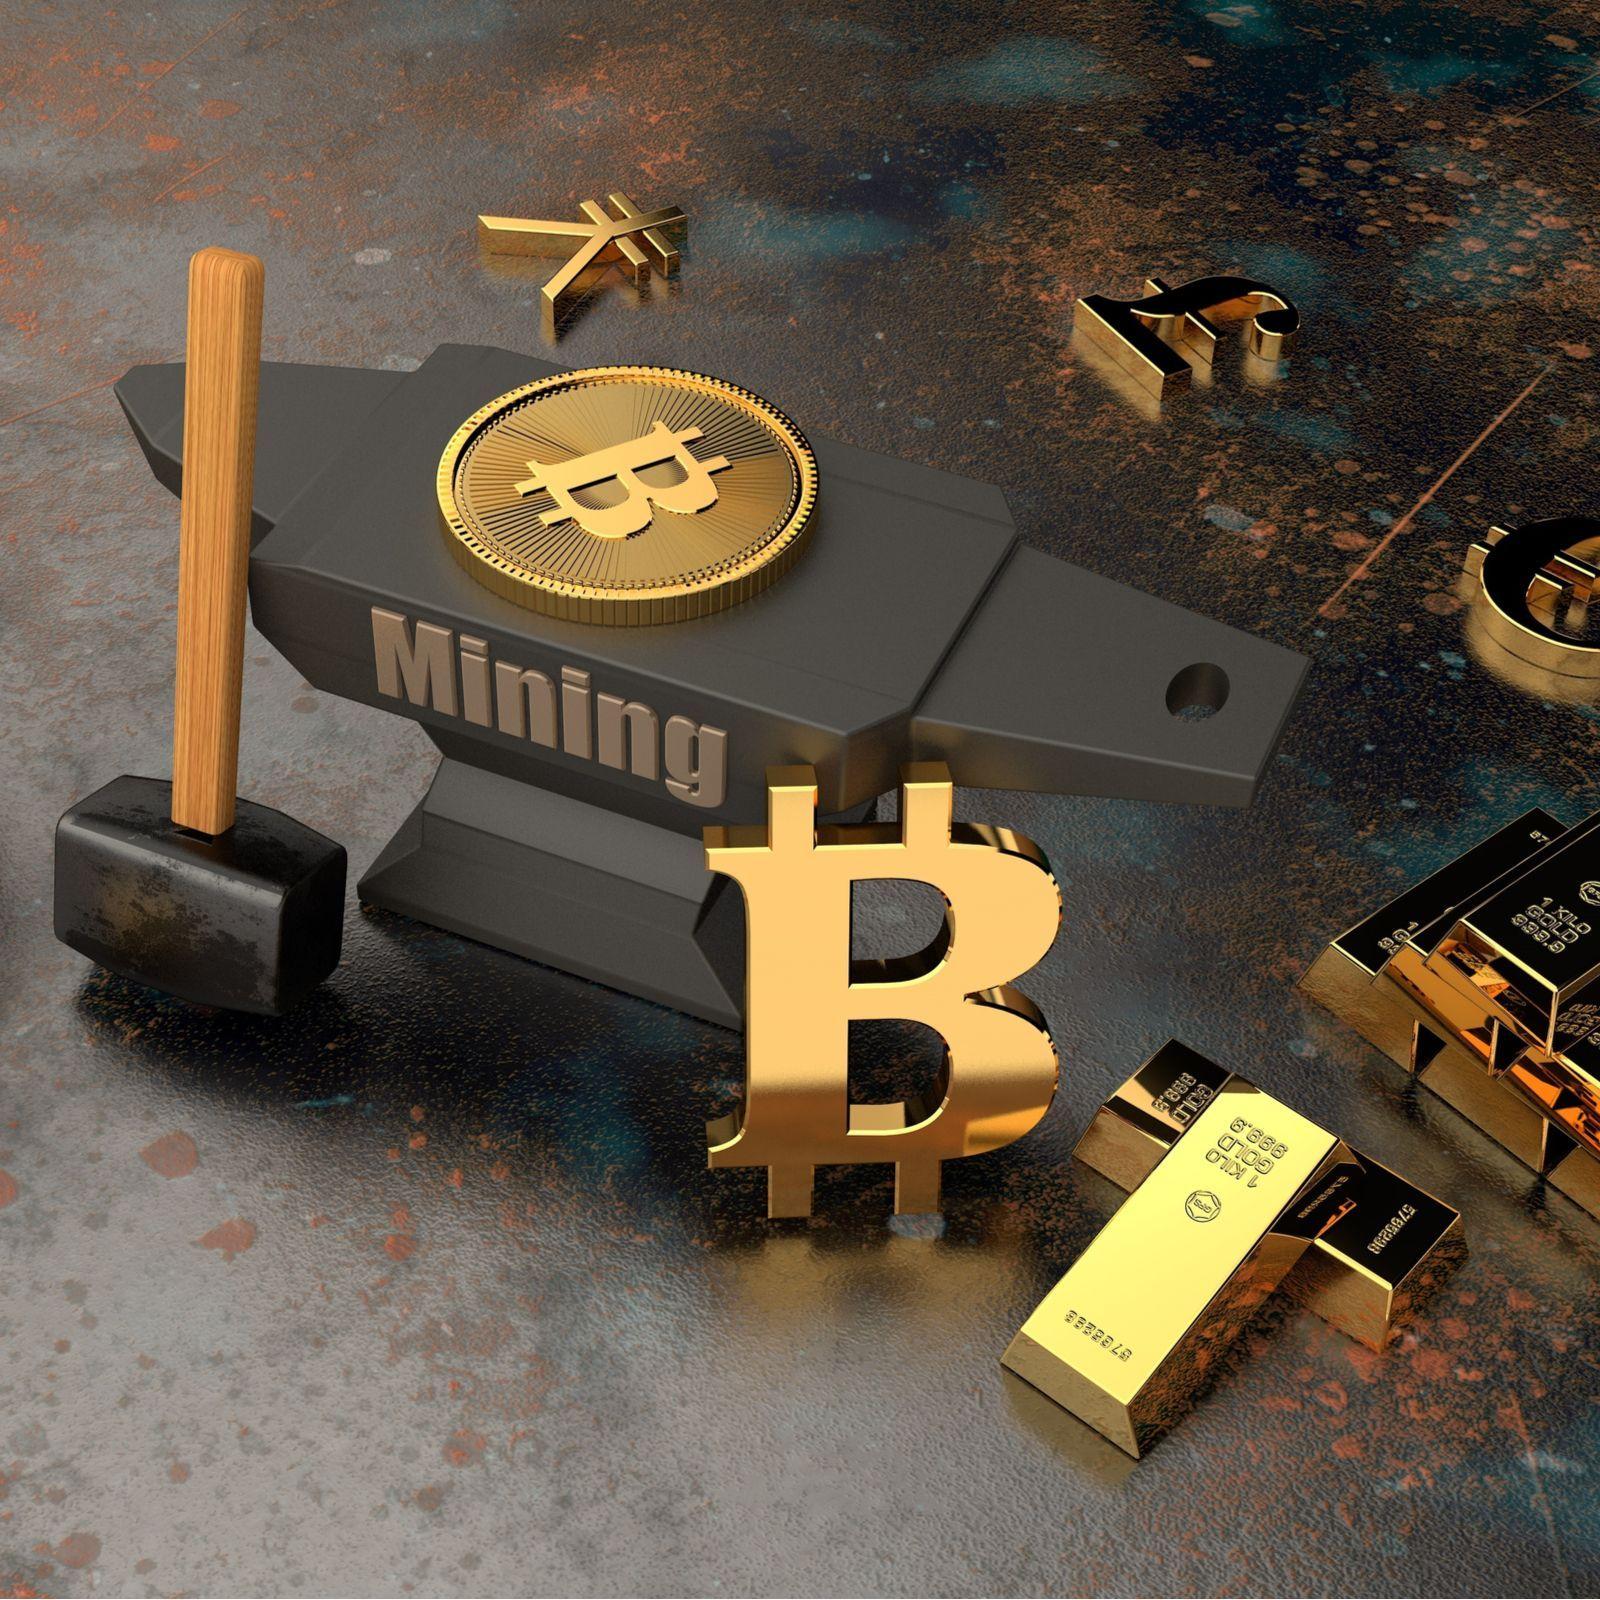 christopher mining bitcoins